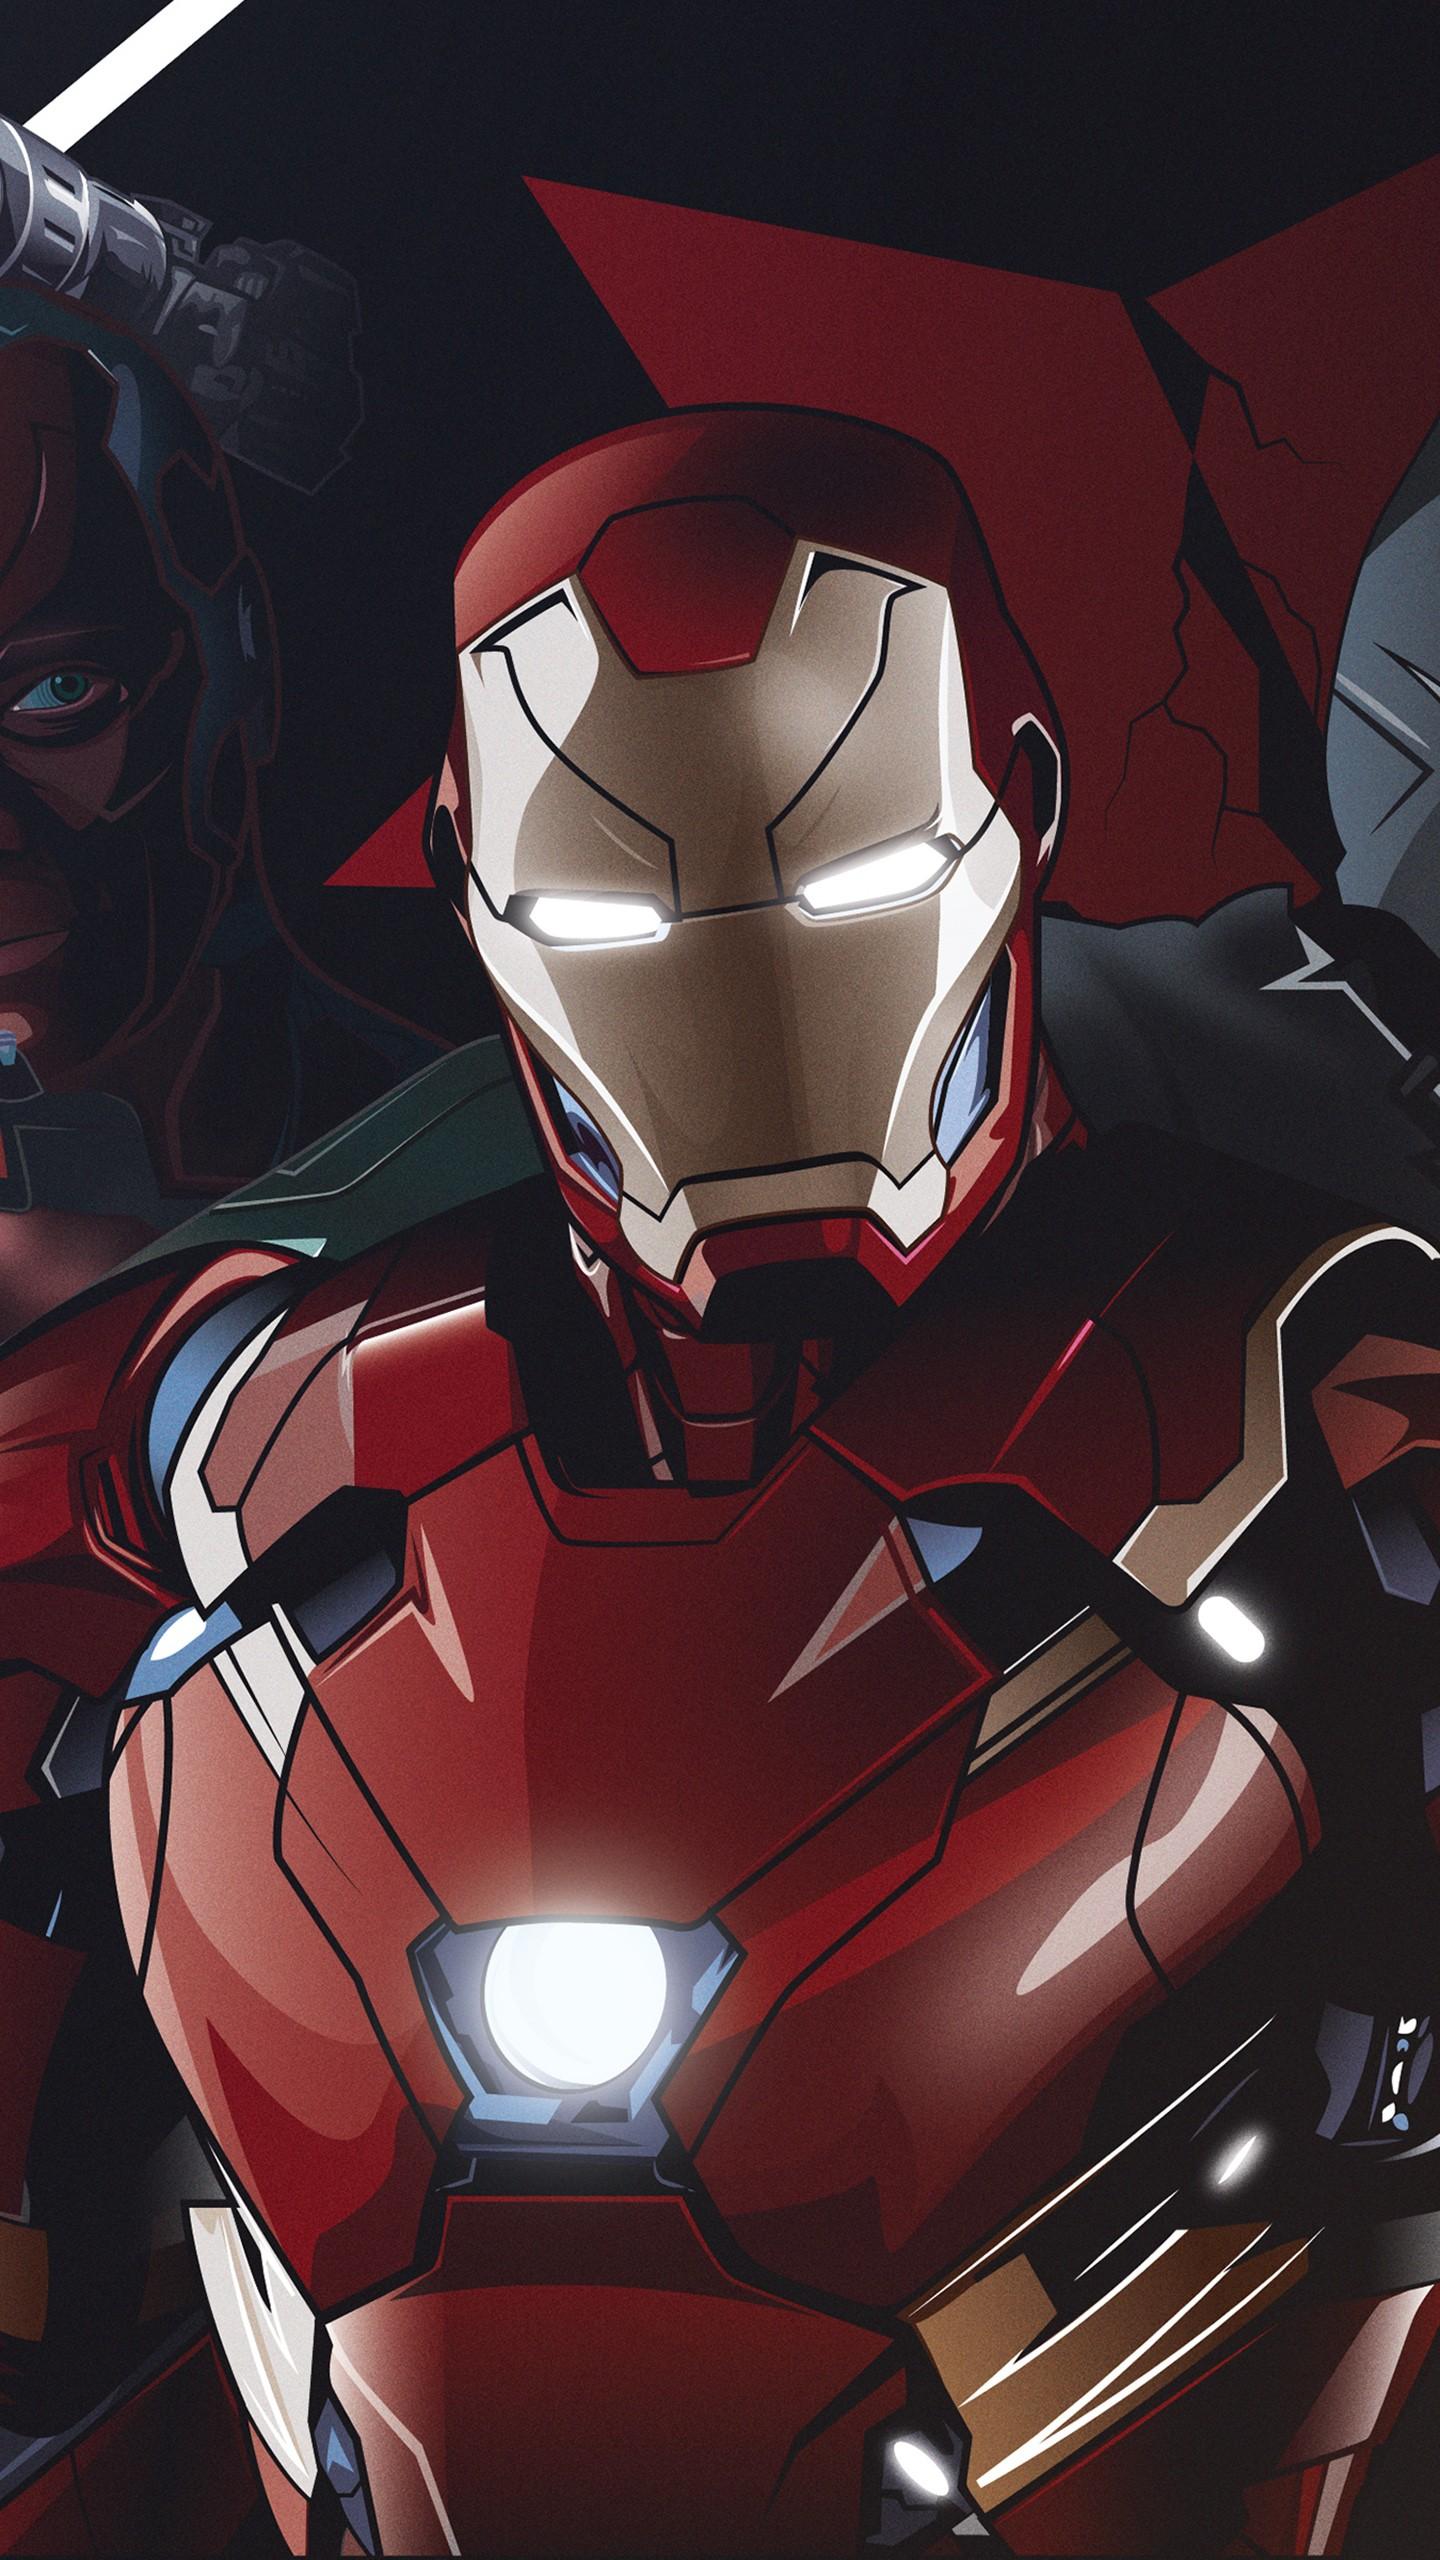 Superhero Hd Wallpapers Iphone Marvel Superheroes 4k Wallpapers Hd Wallpapers Id 24925